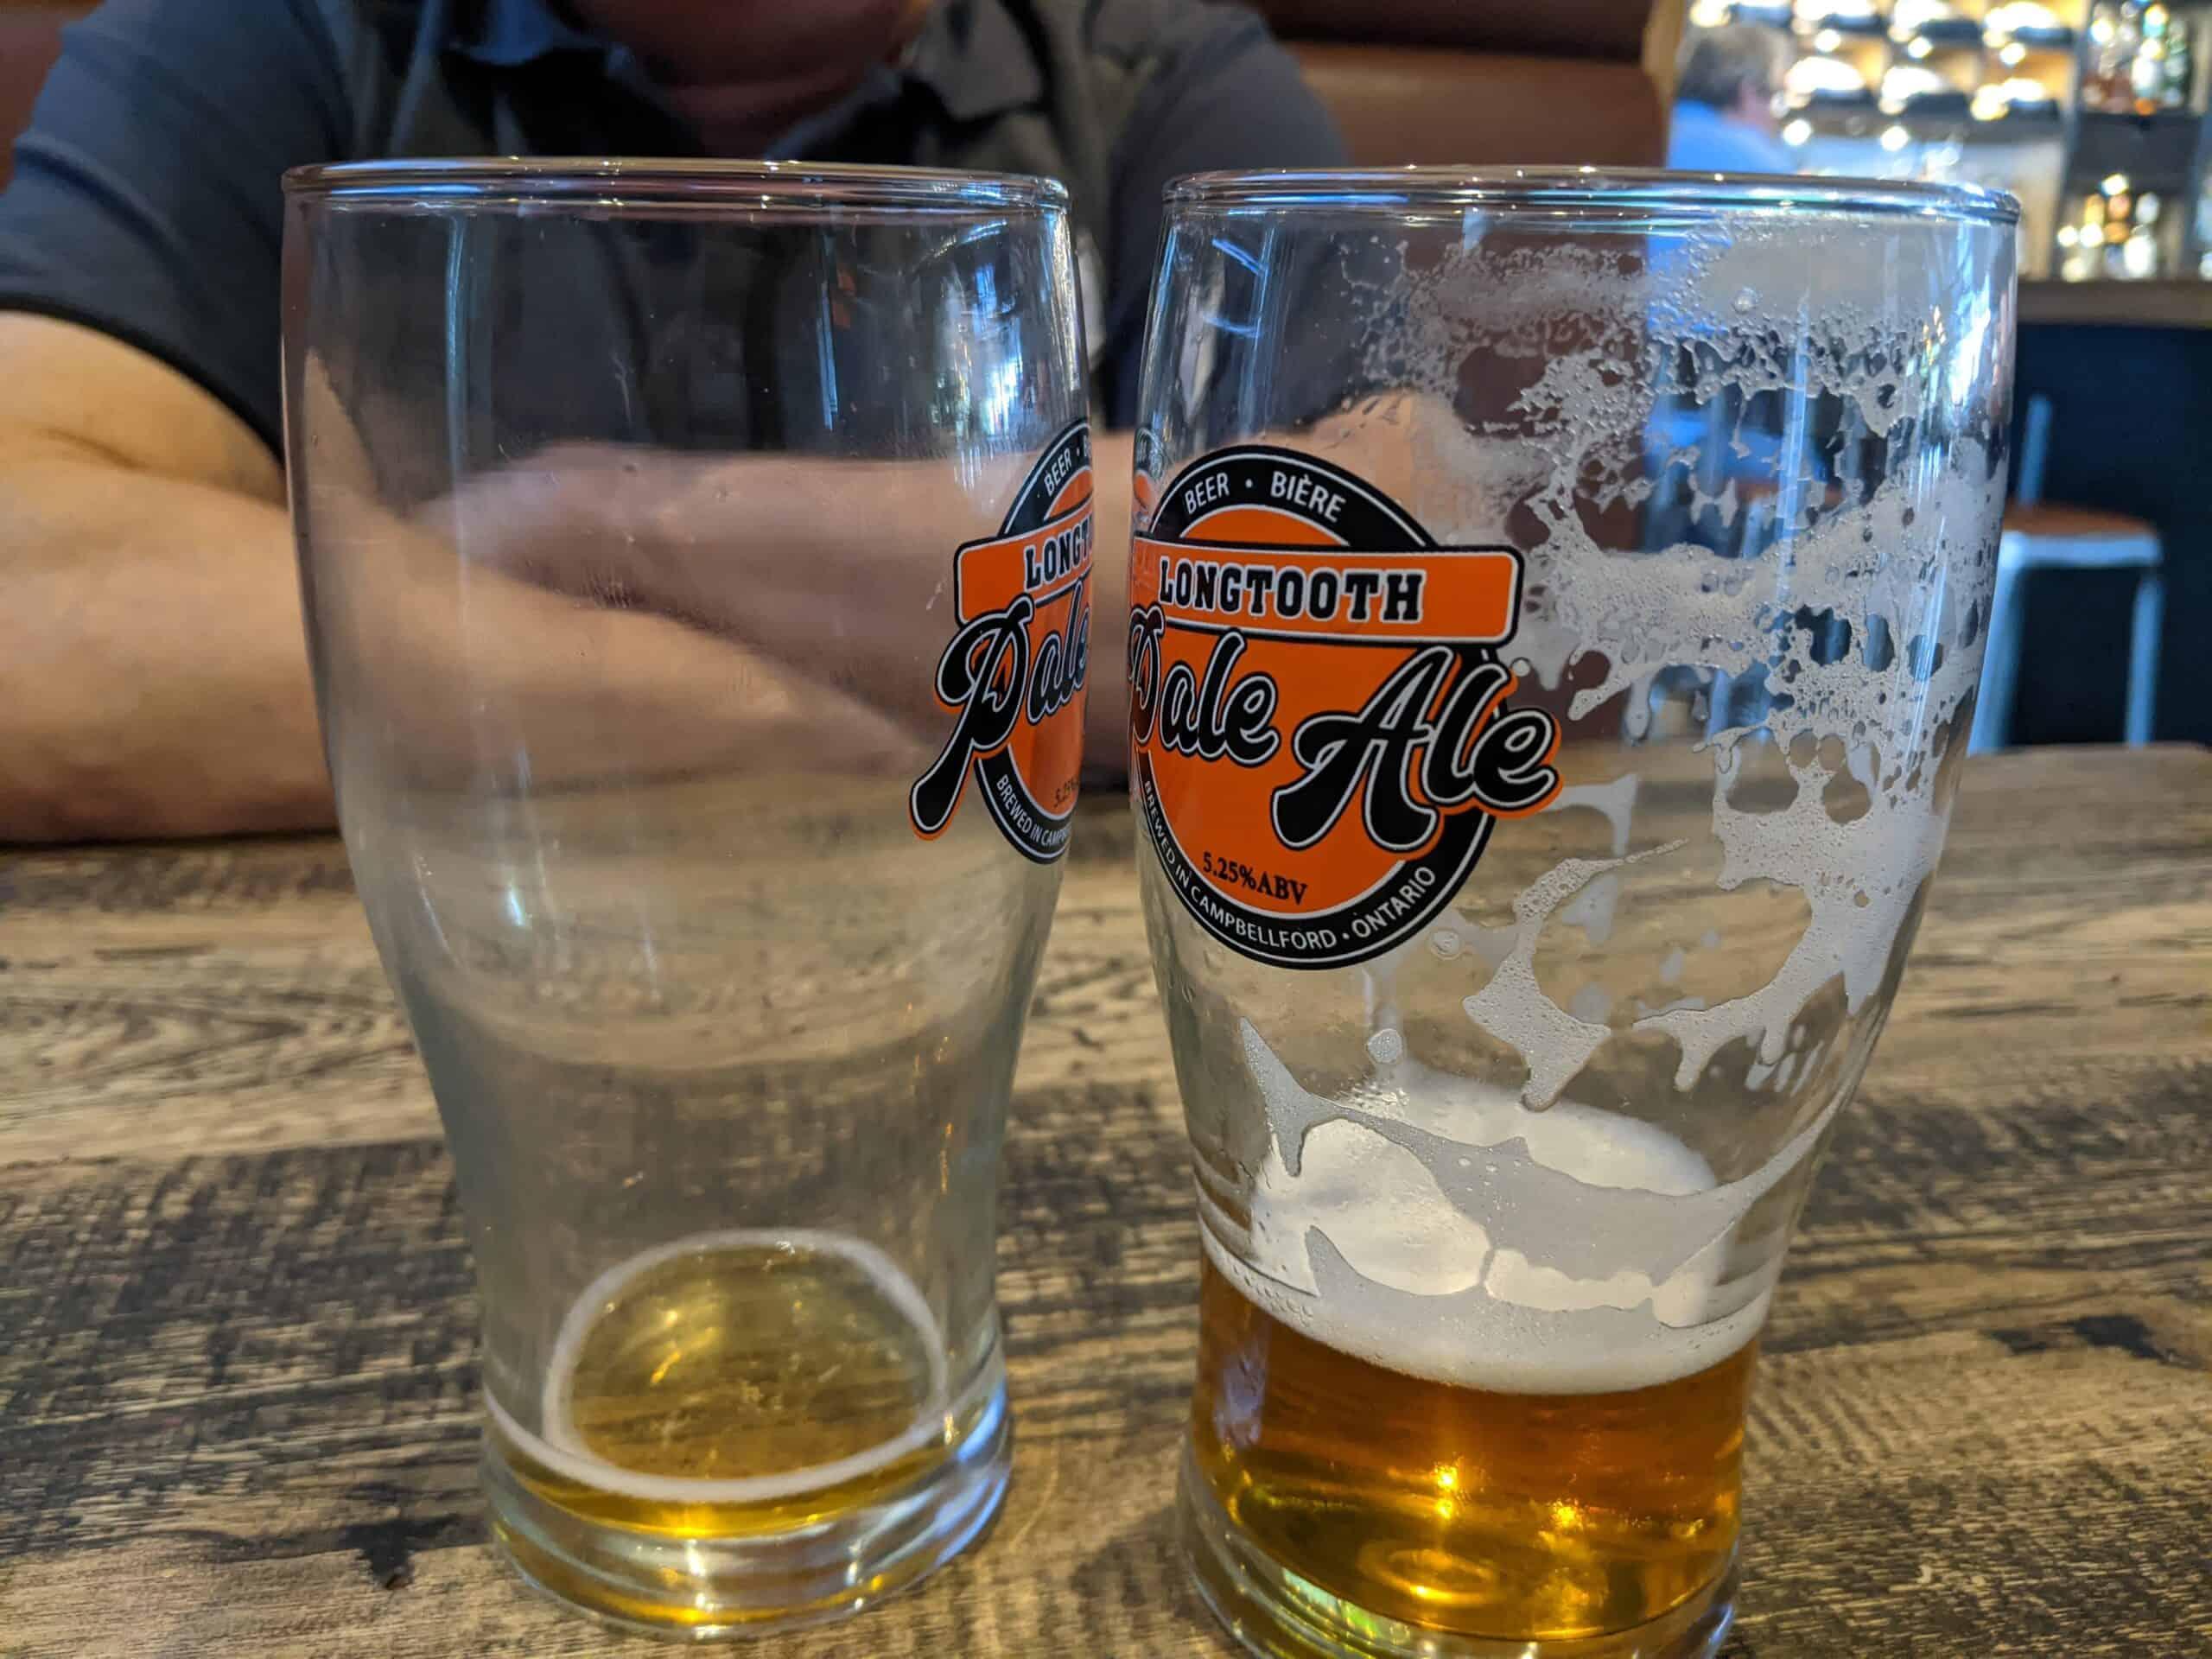 Dirty beer glass vs clean beer glass